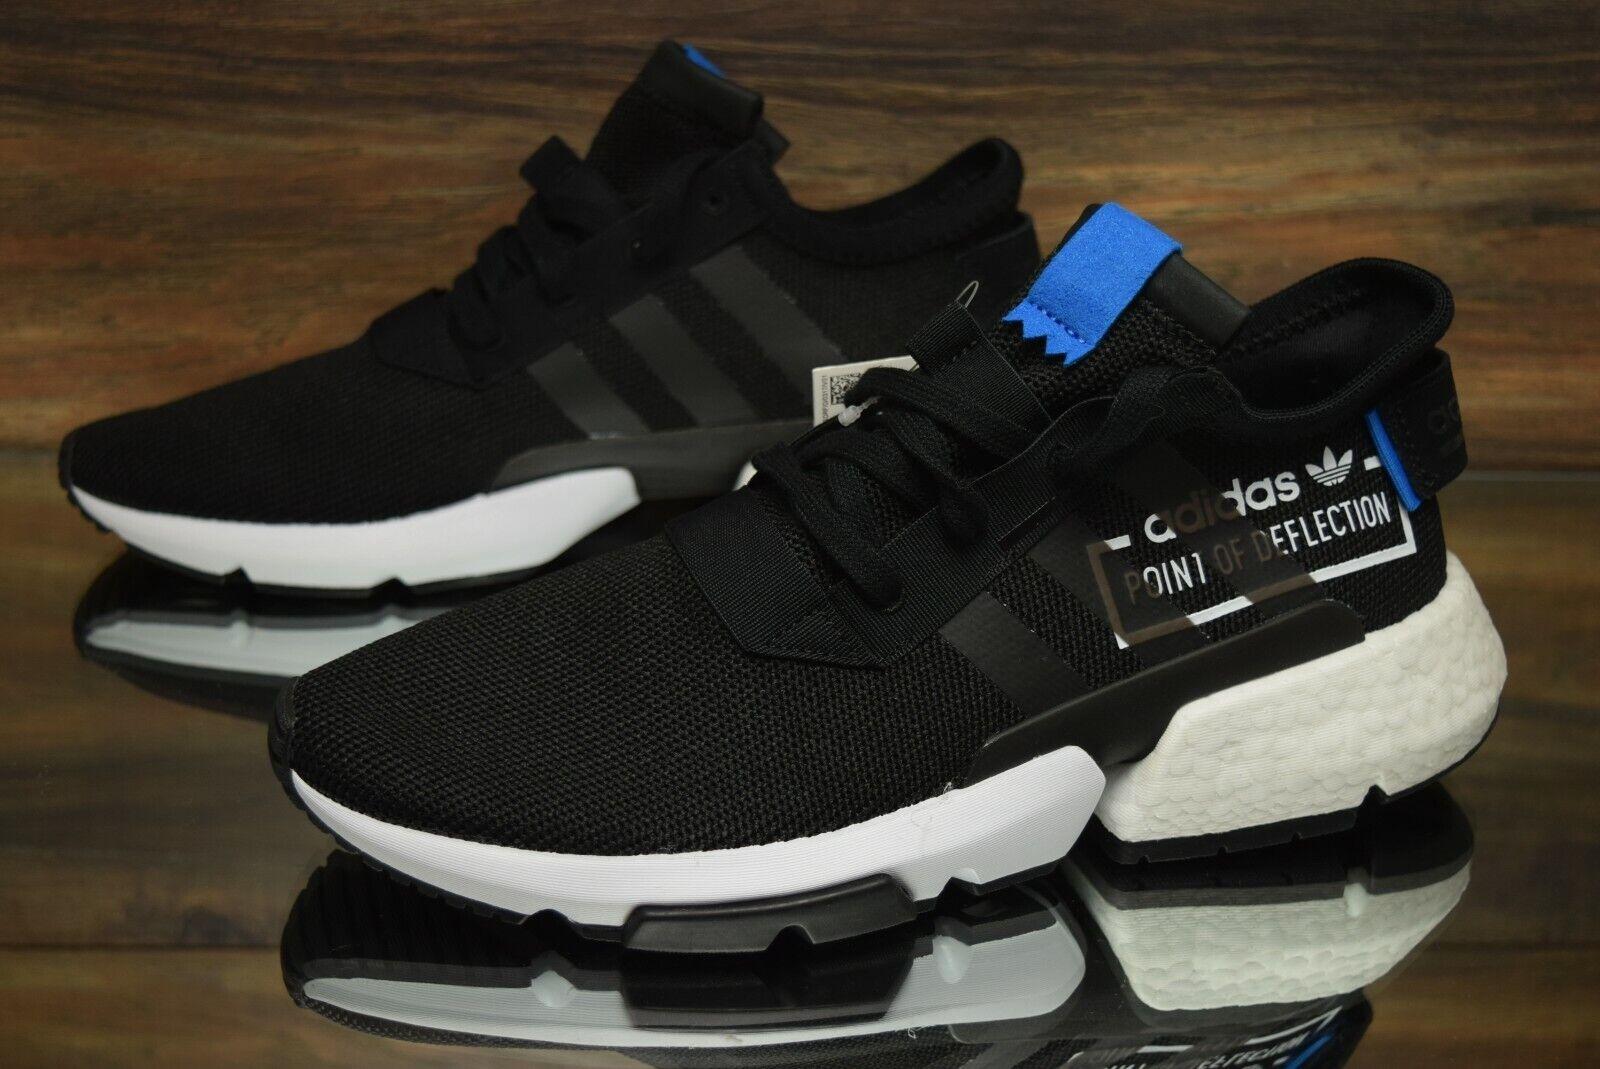 Adidas POD-s3.1 Black White CG6884 Running shoes Men's Multi Size NEW